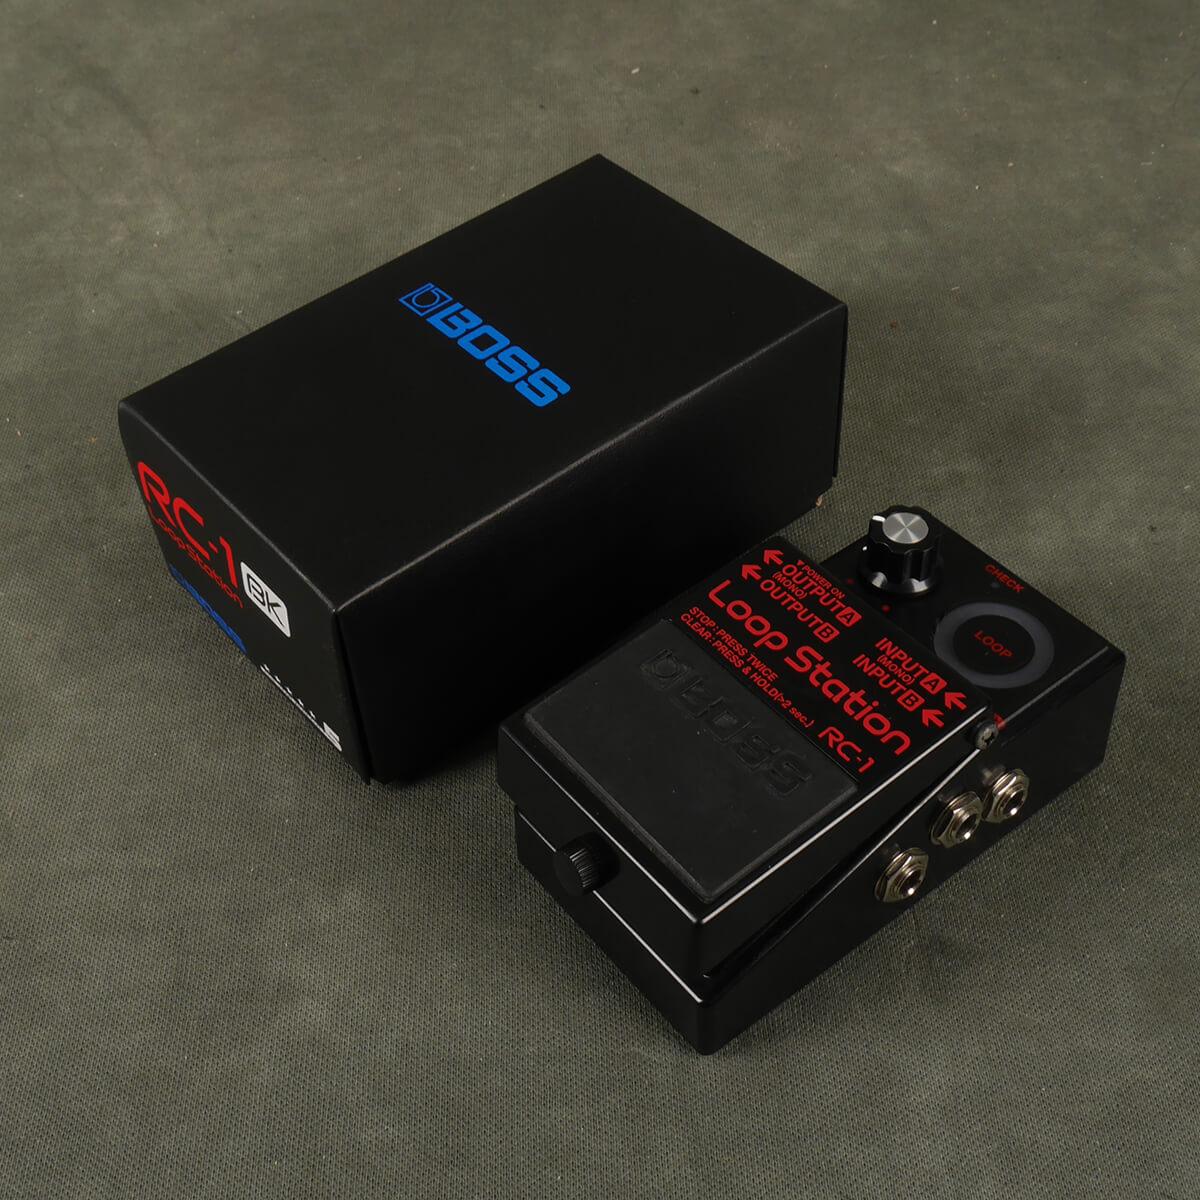 Boss RC-1 Looper FX Pedal - Ltd Edition Black w/Box - 2nd Hand